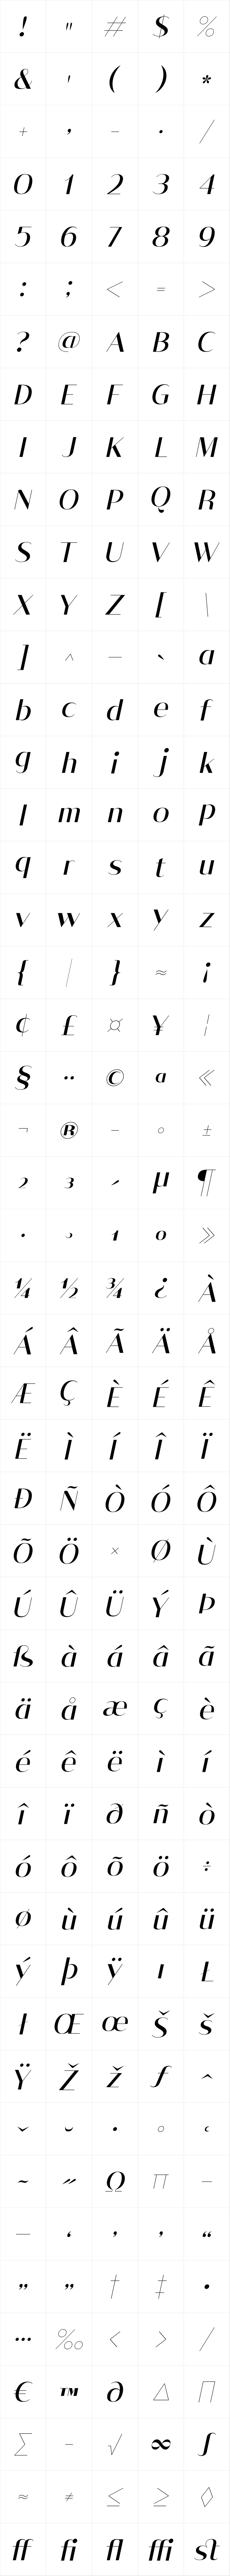 Vage Light Italic